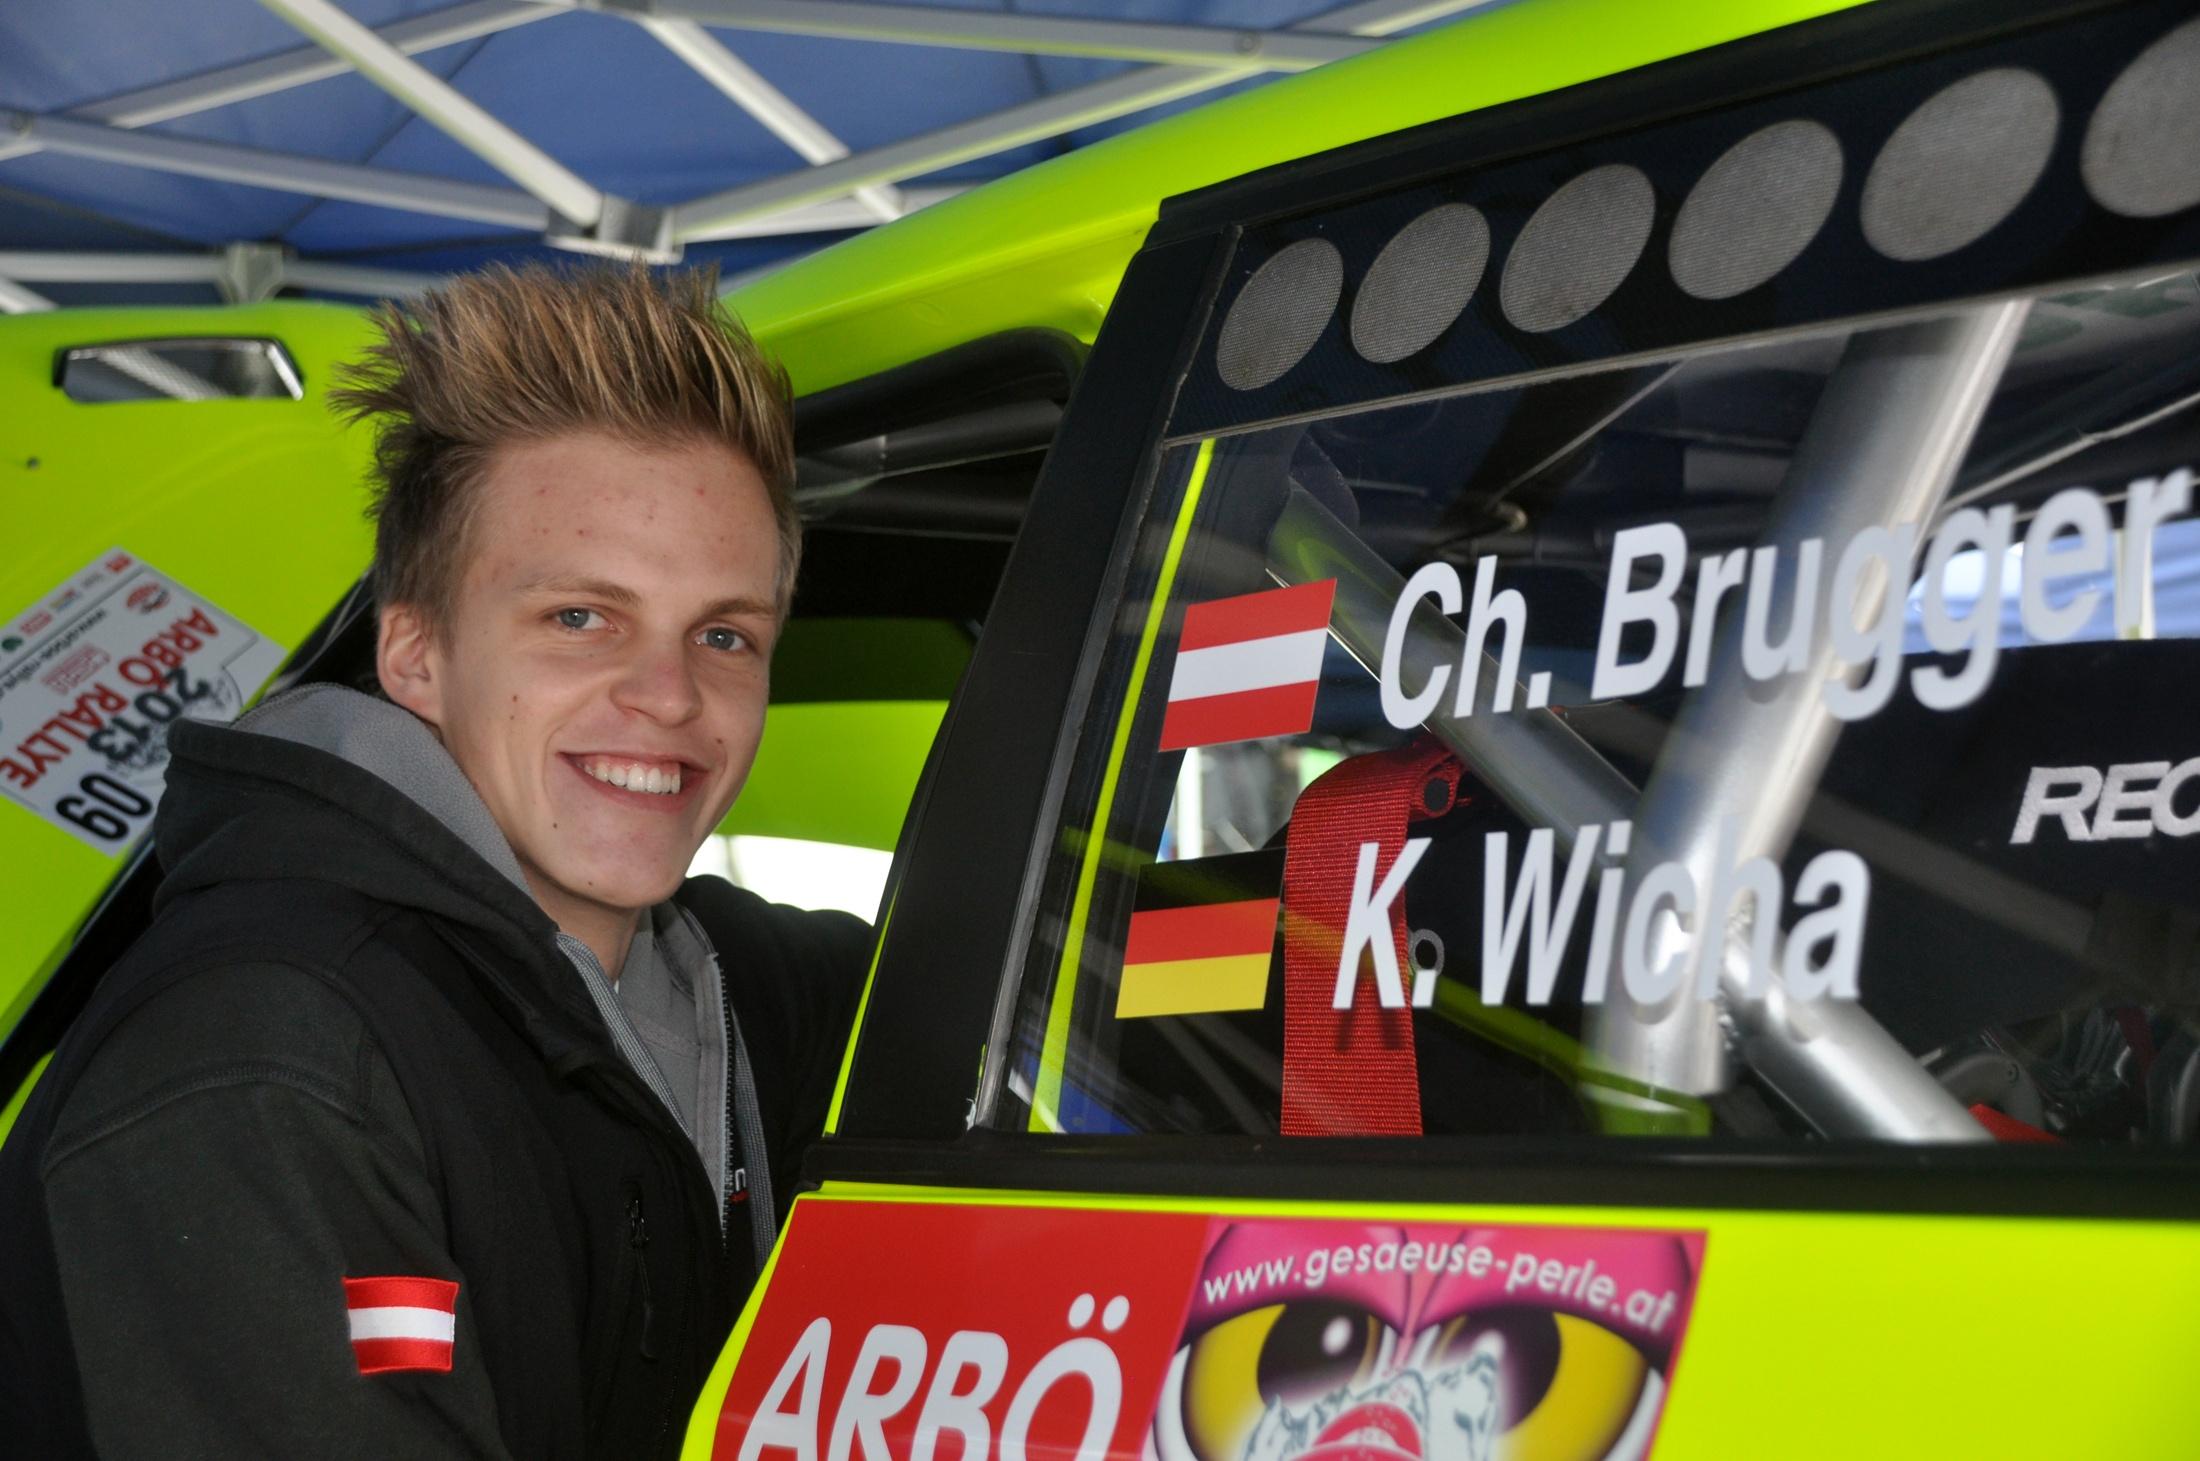 Chris Brugger